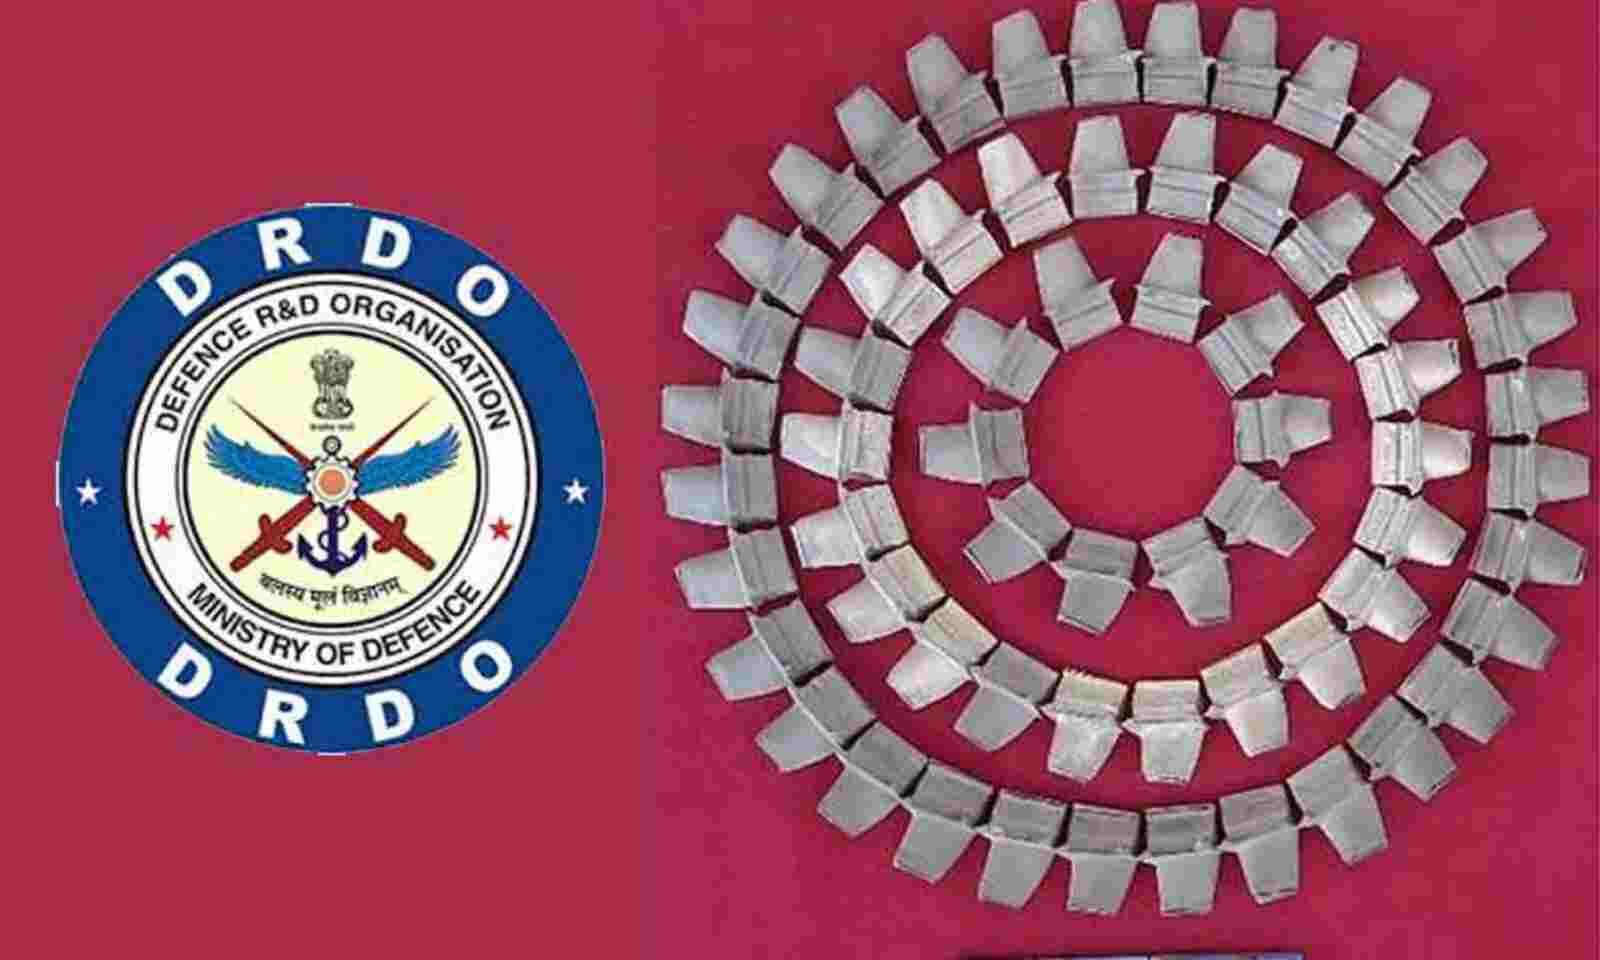 DRDO develops single crystal blades for helicopter engines | DRDO హెలికాప్టర్ ఇంజిన్ల కోసం సింగిల్ క్రిస్టల్ బ్లేడ్లను అభివృద్ధి చేస్తుంది |_40.1